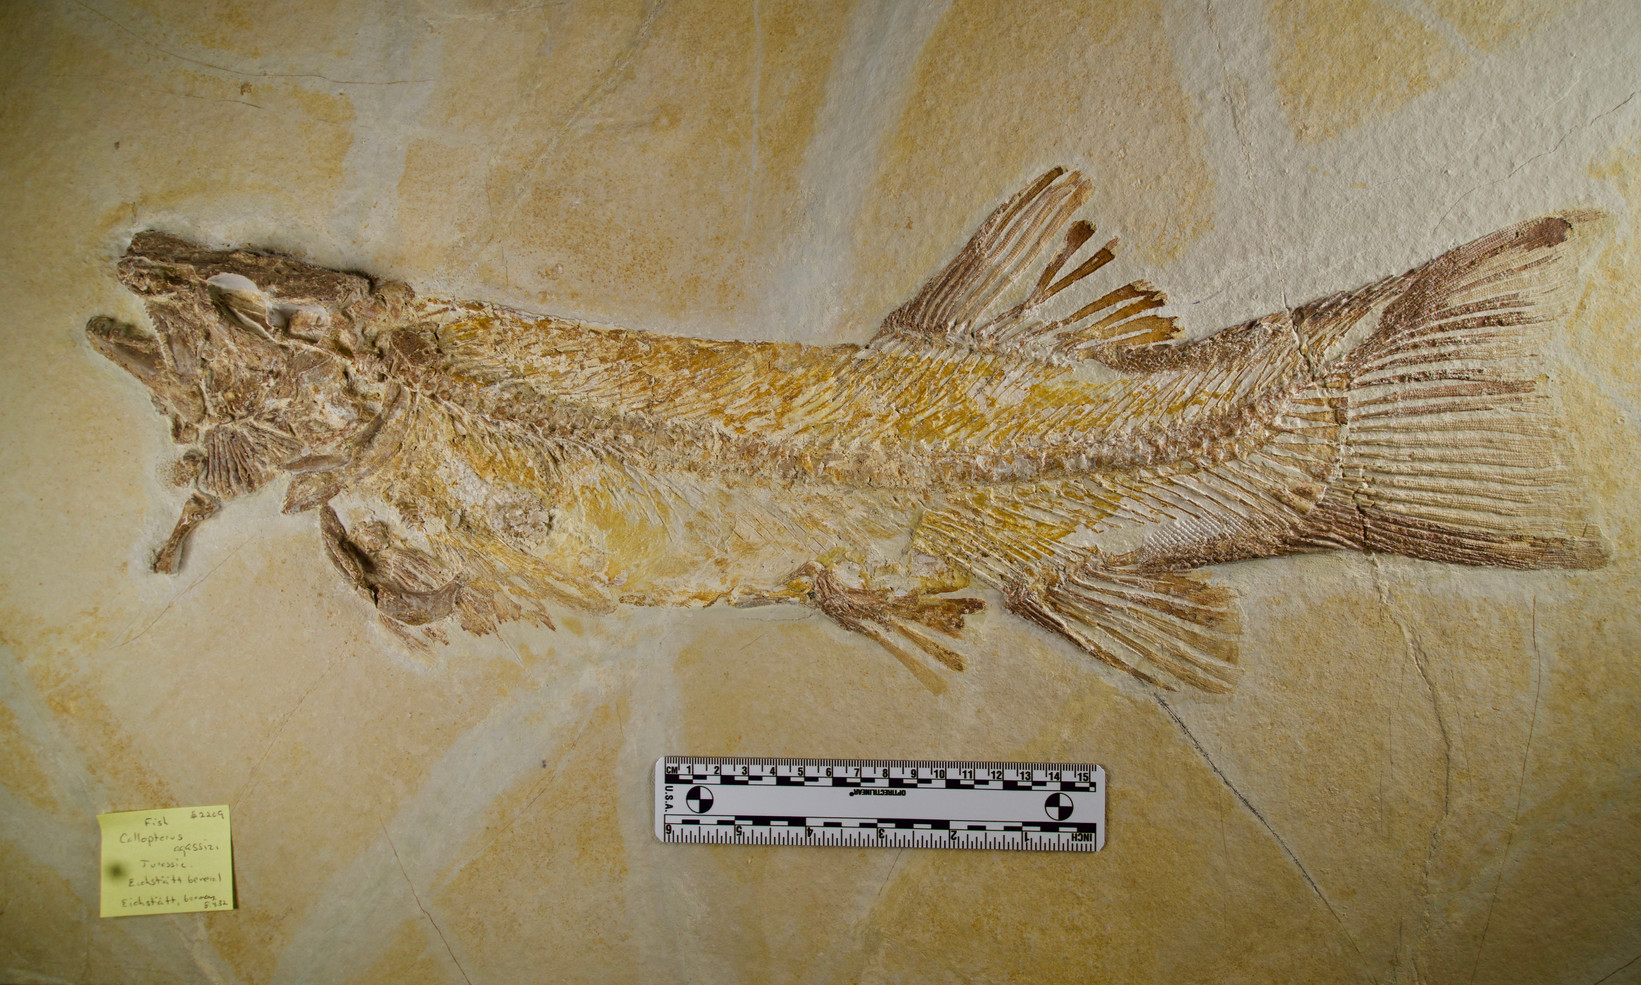 Fish   Callopterus agassizi  Eichstätt, Germany